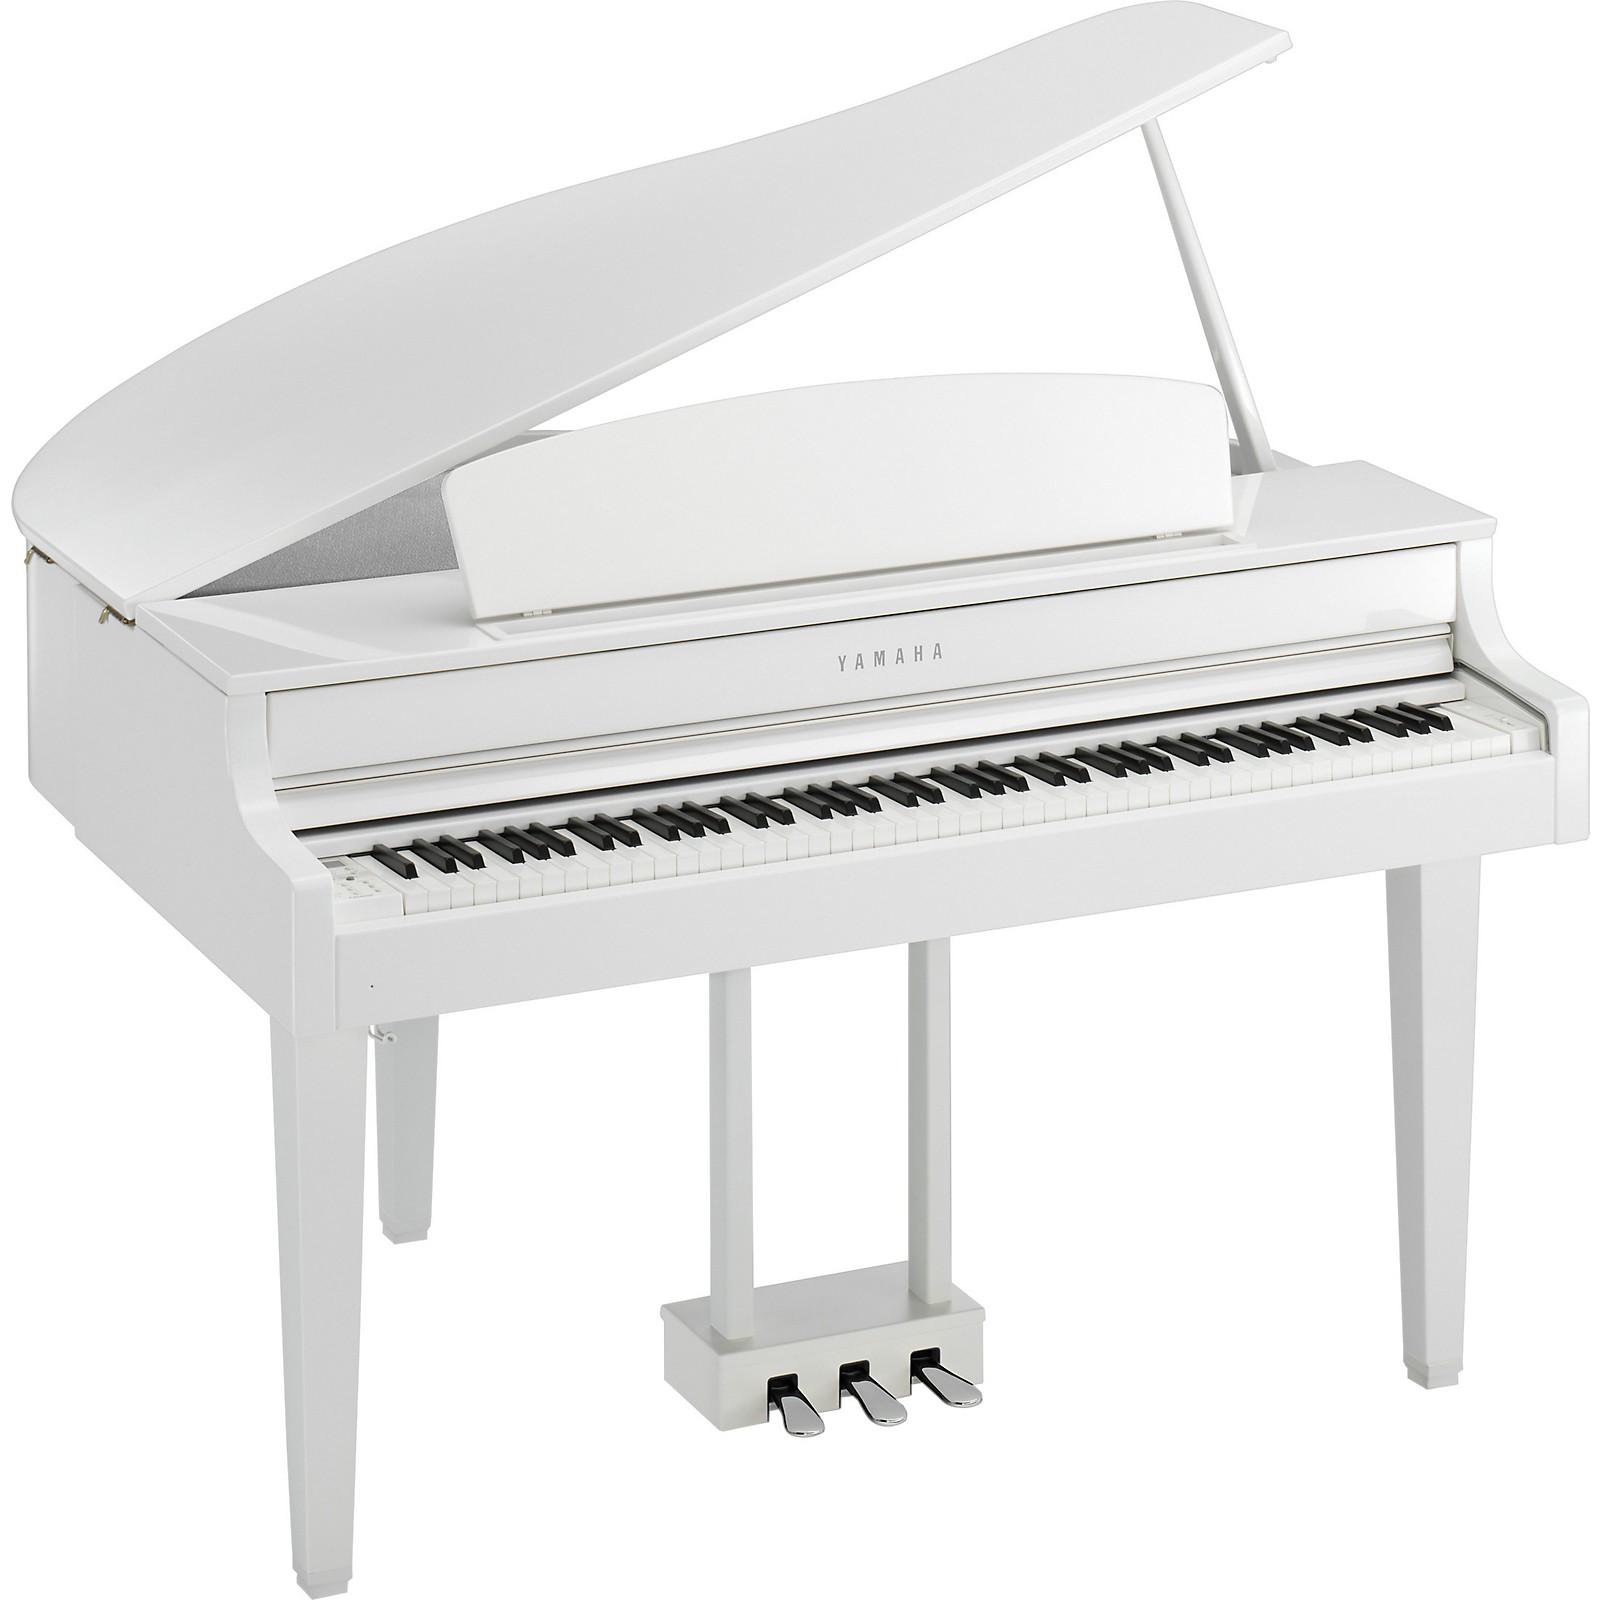 Yamaha Clavinova CLP-665 Digital Grand Piano with Bench